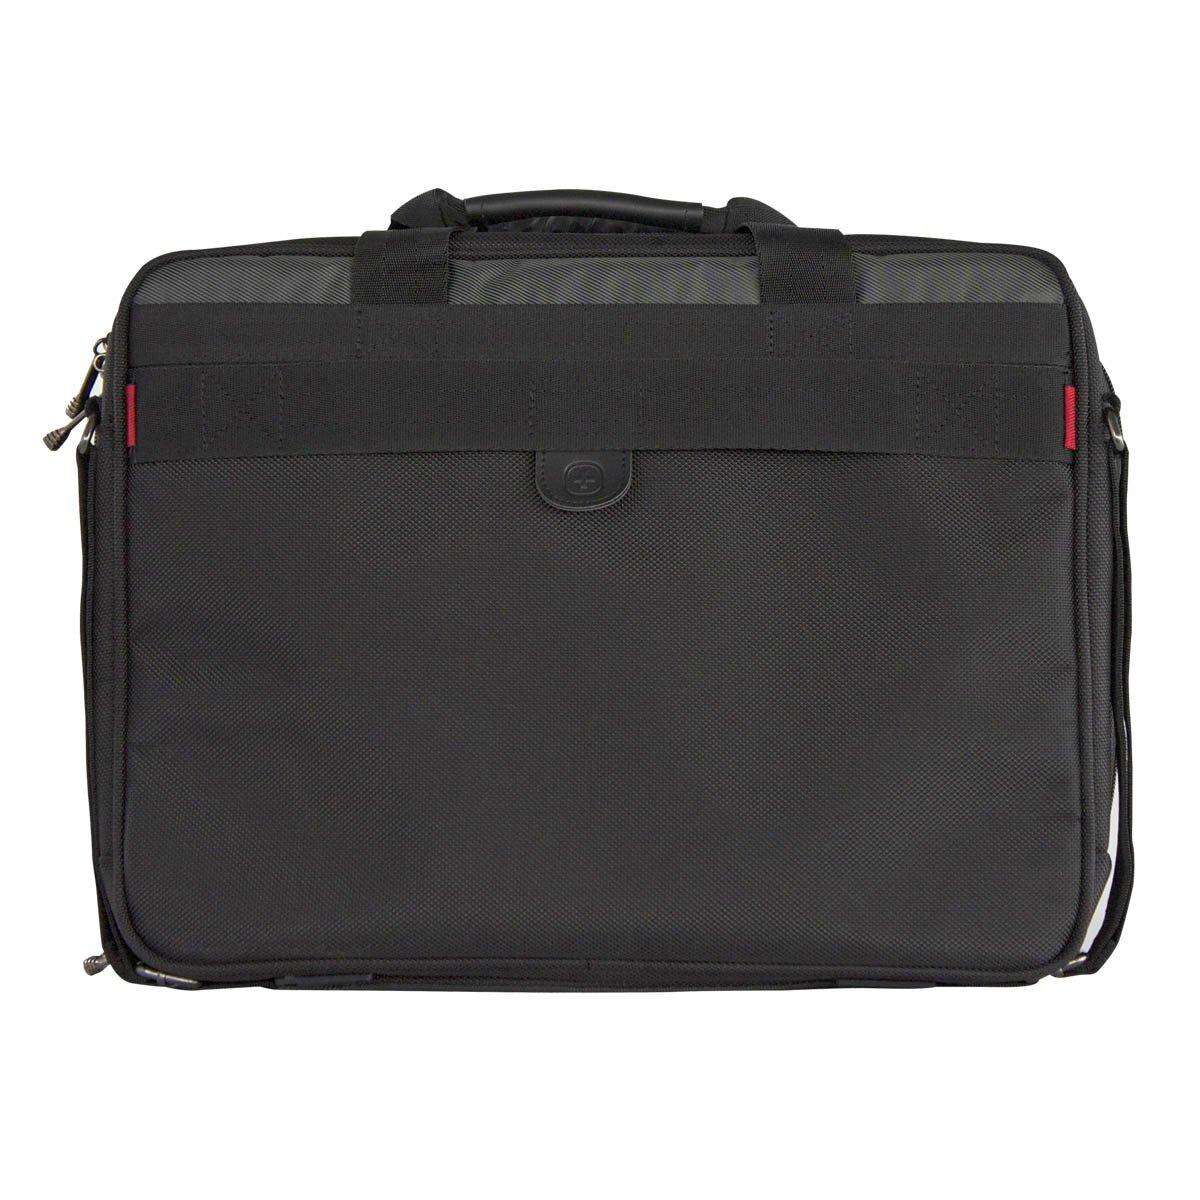 Malet n porta laptop 16 legacy negro con gris - Notebook con porta parallela ...